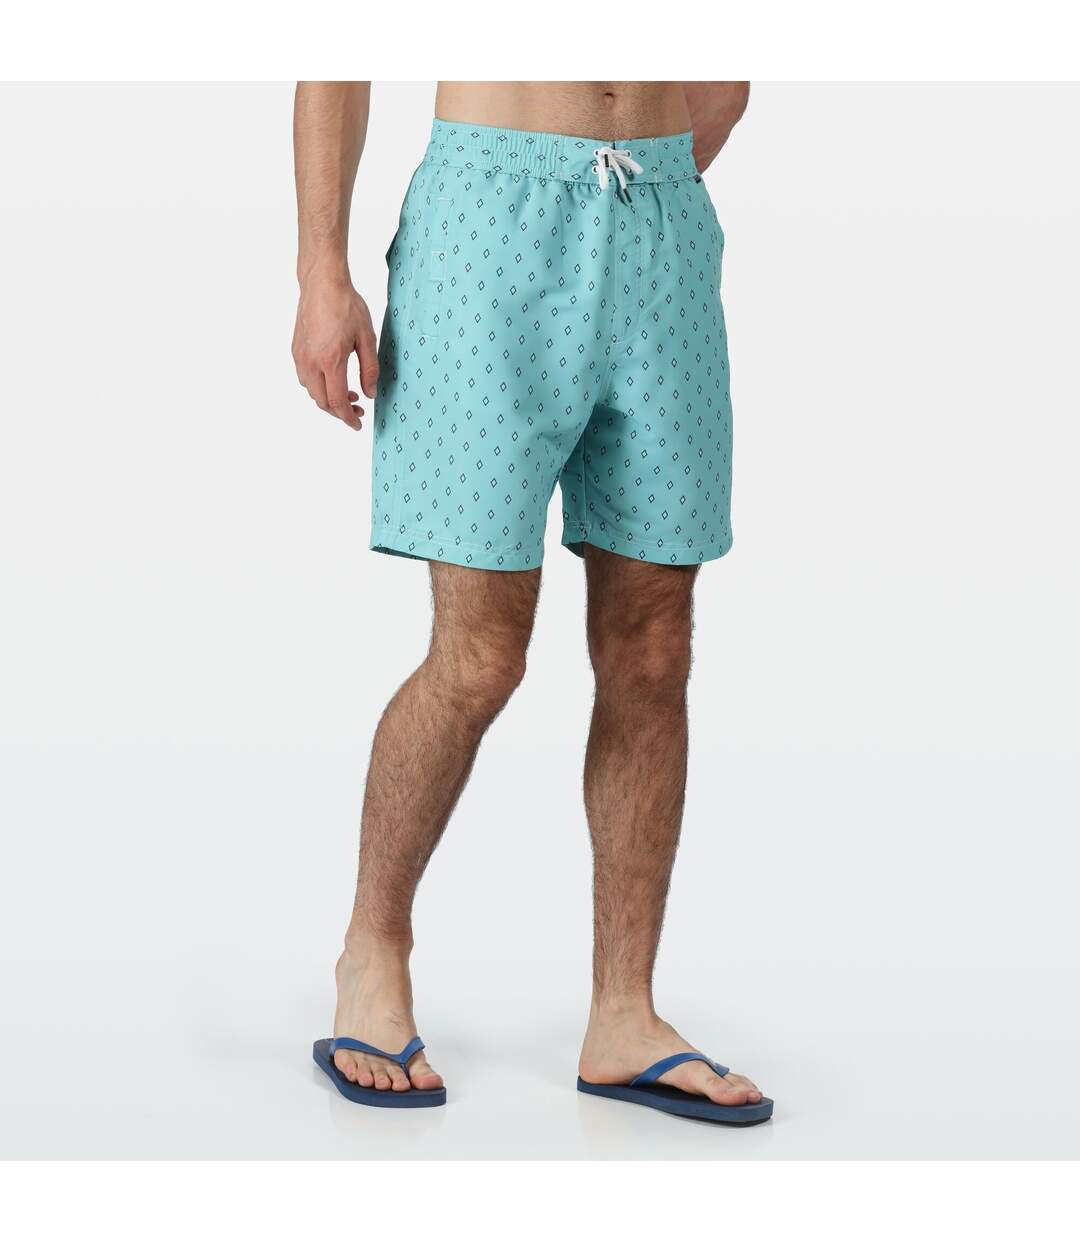 Regatta Mens Hadden II Quick Drying Board Shorts (Maui Blue) - UTRG4175